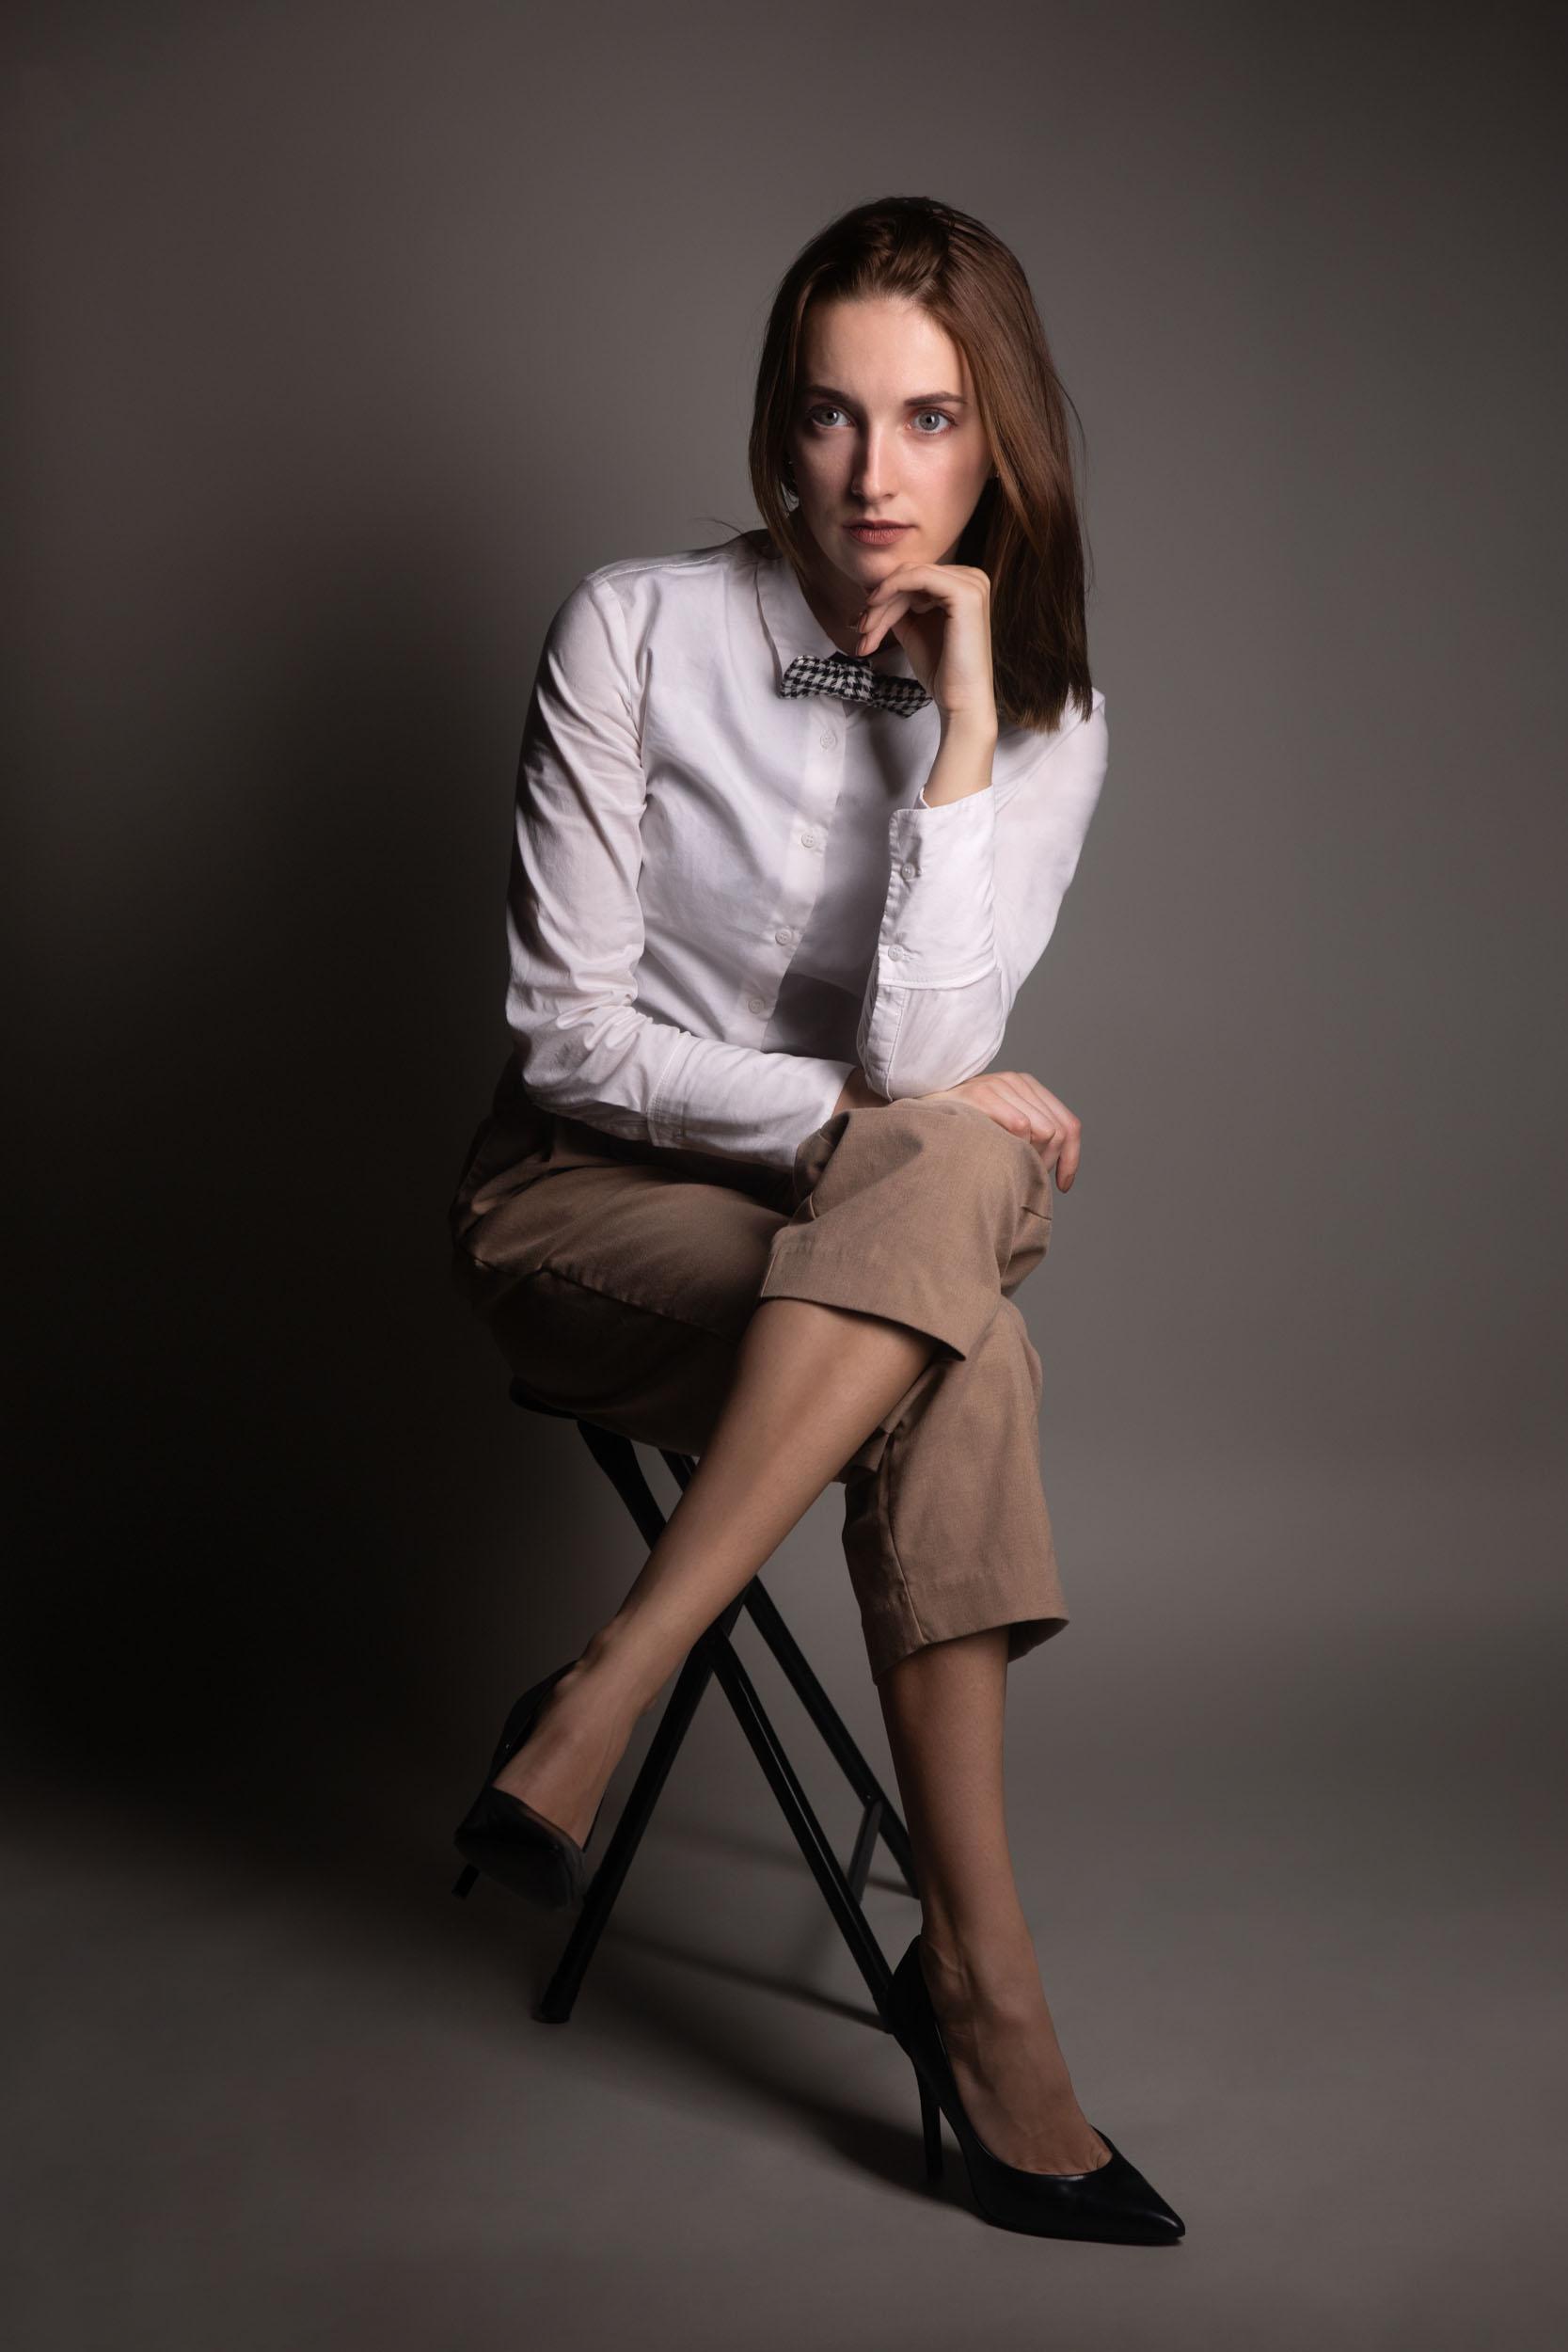 portraitfotografie fotograf filmemacher frankfurt patrick schmetzer portrait frau fashion 1